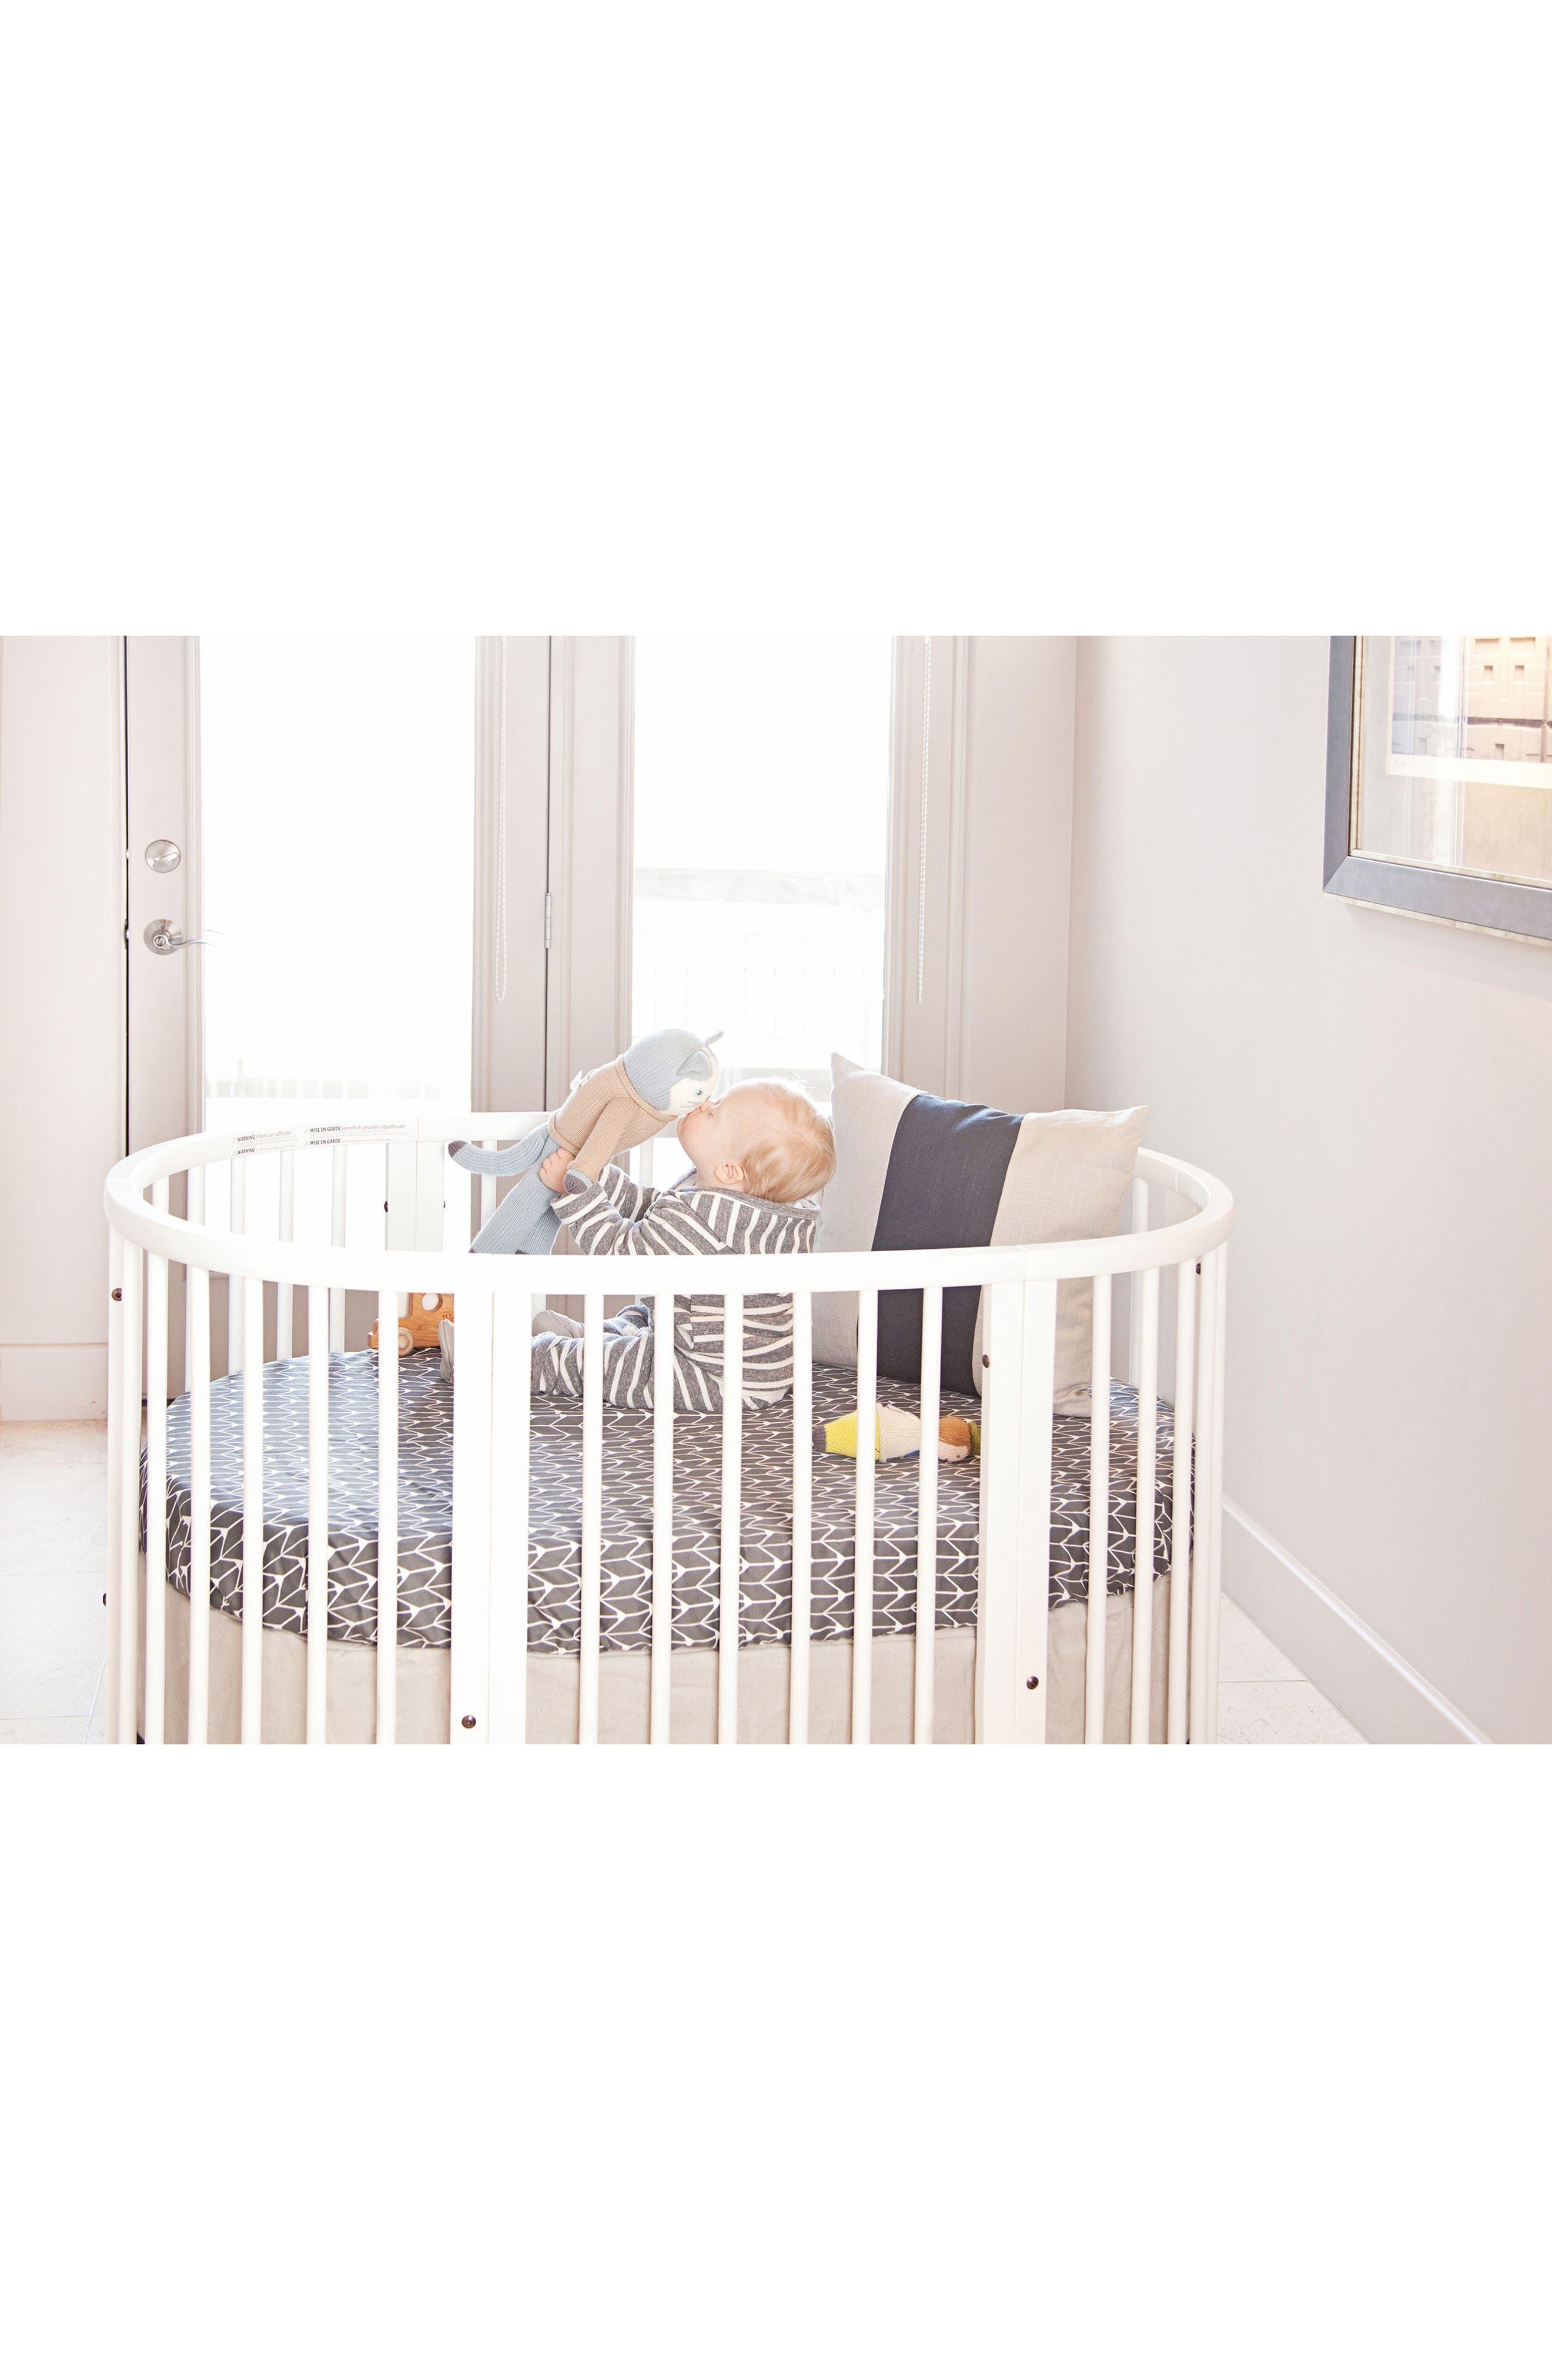 300 Thread Count Crib Sheet for Stokke Sleepi Crib,                             Alternate thumbnail 6, color,                             Charcoal